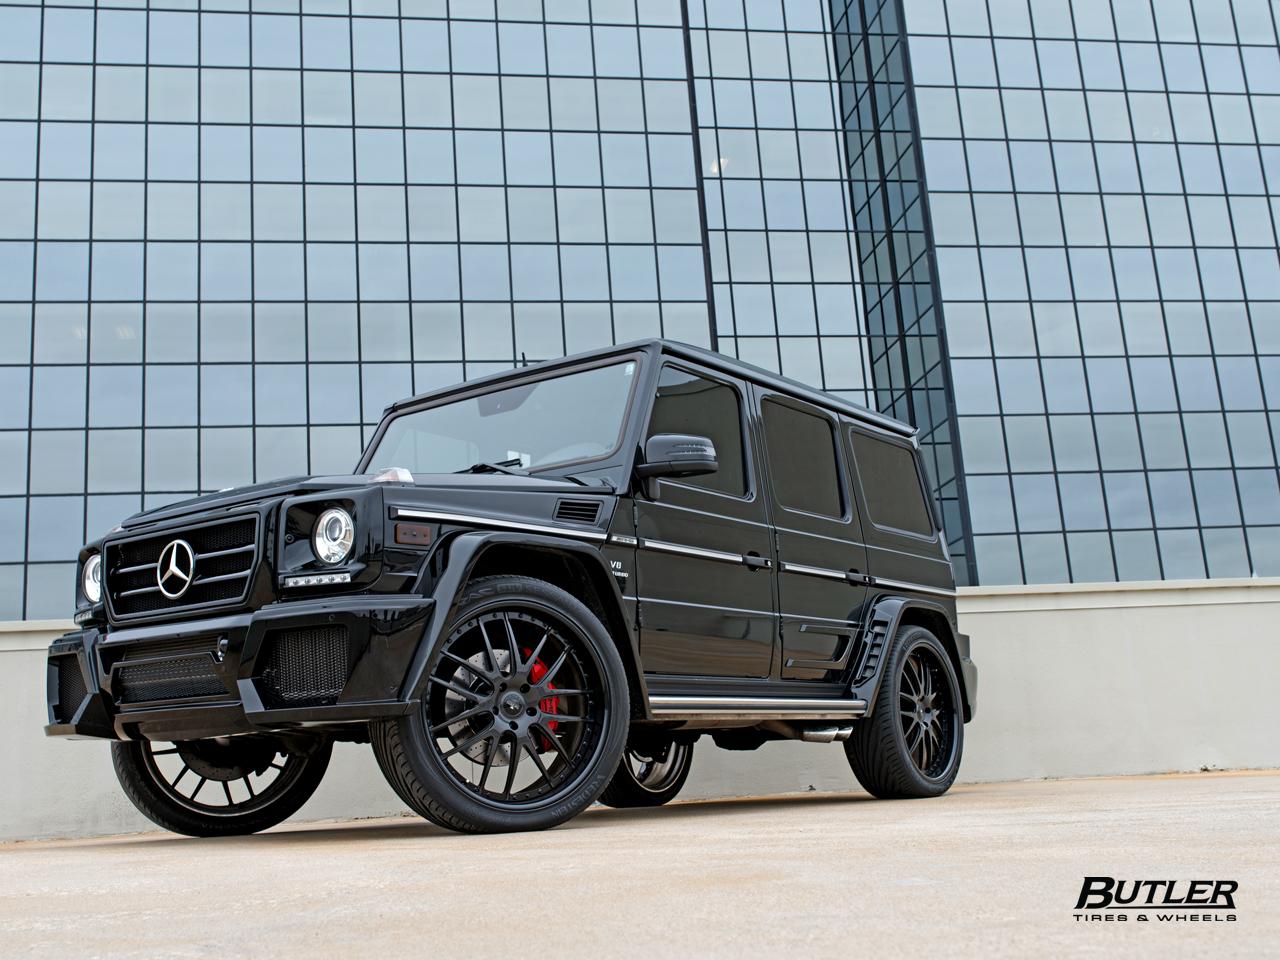 Lifted G Wagon >> Wald Black Bison Mercedes Benz G63 AMG Wagon on Savini ...